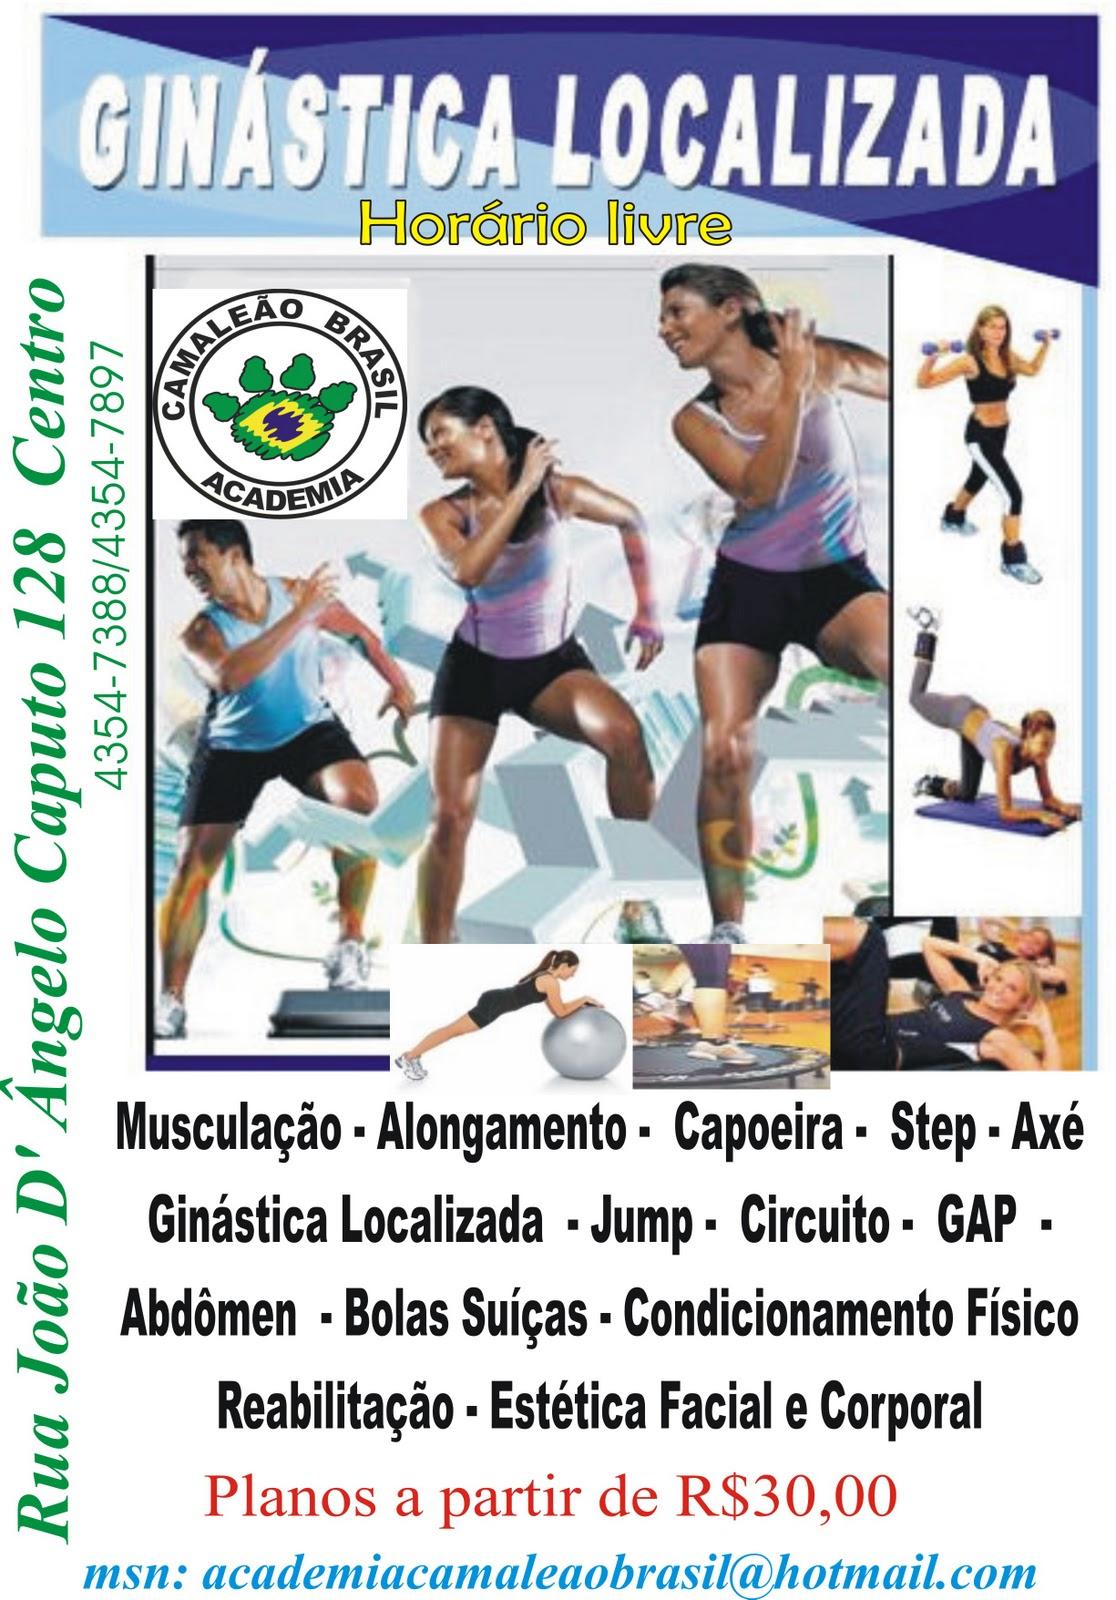 Circuito Na Academia : Academia camaleÃo brasil